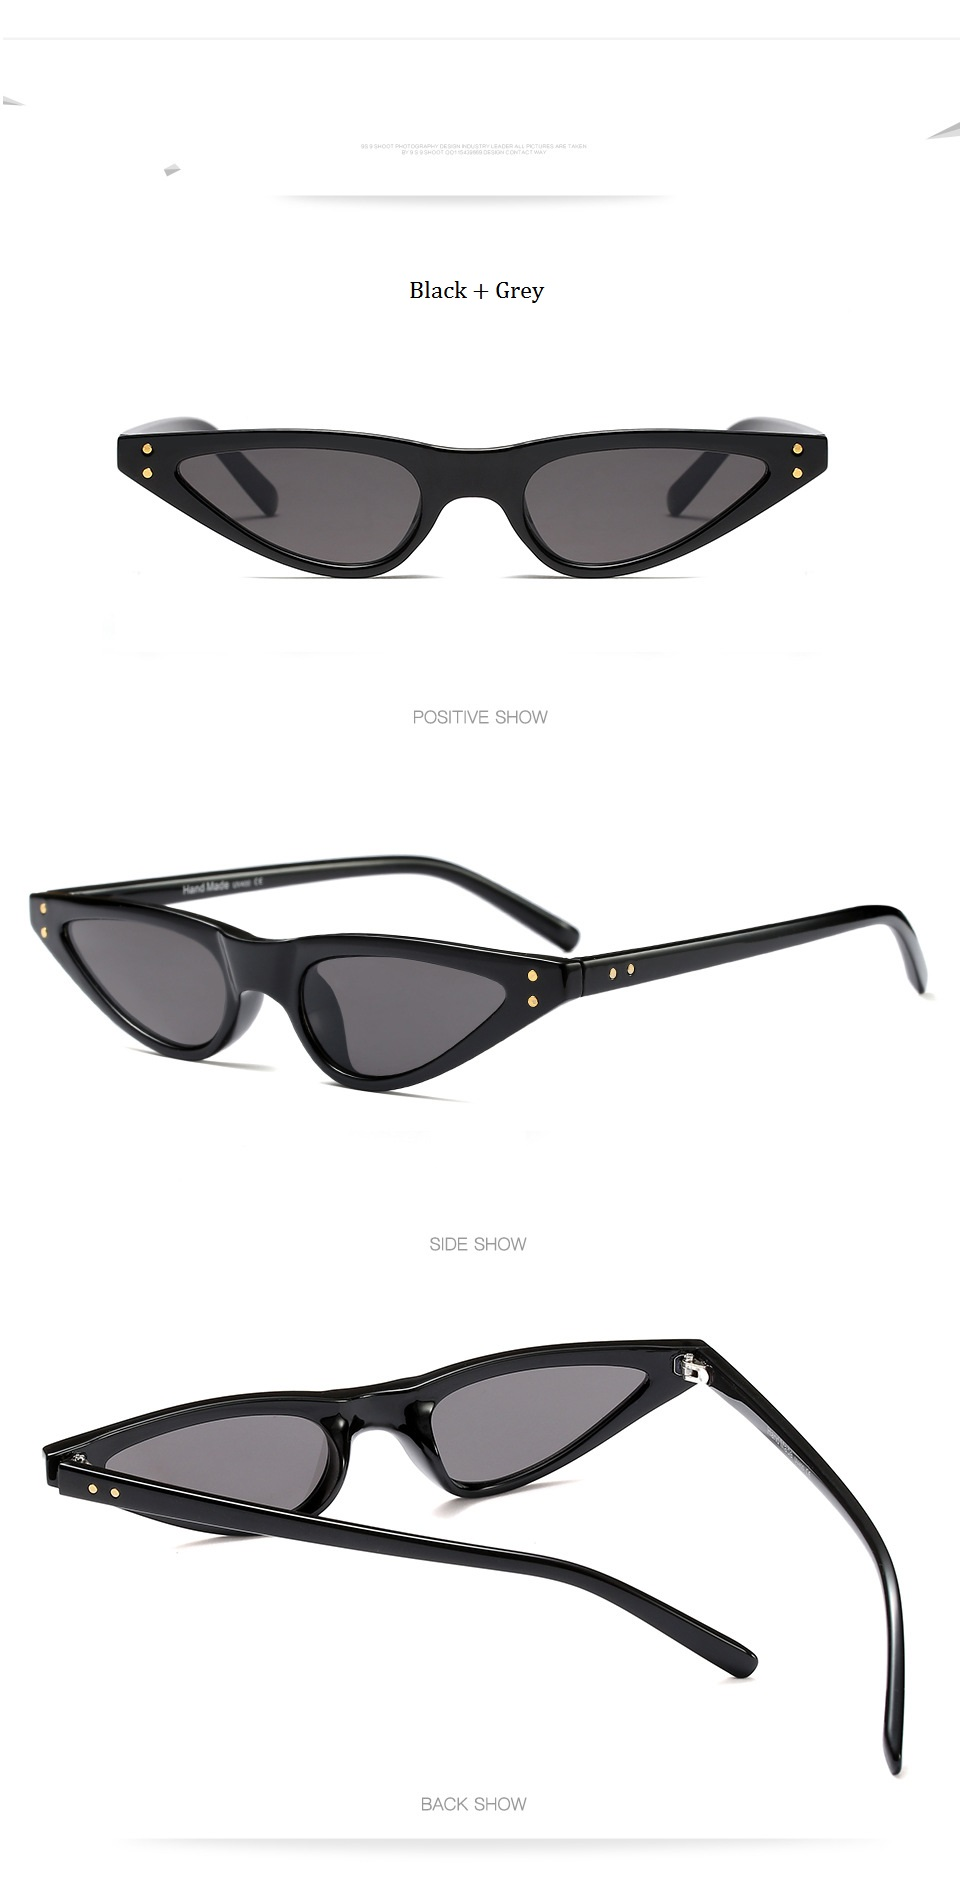 HTB1pxc6ckfb uJjSsrbq6z6bVXau - Unisex Flat Top Eyeglasses Small Triangle Frame Cat Eye Sunglasses Women UV400 2018 Fashion Color Ocean Film Sun Glasses Cool